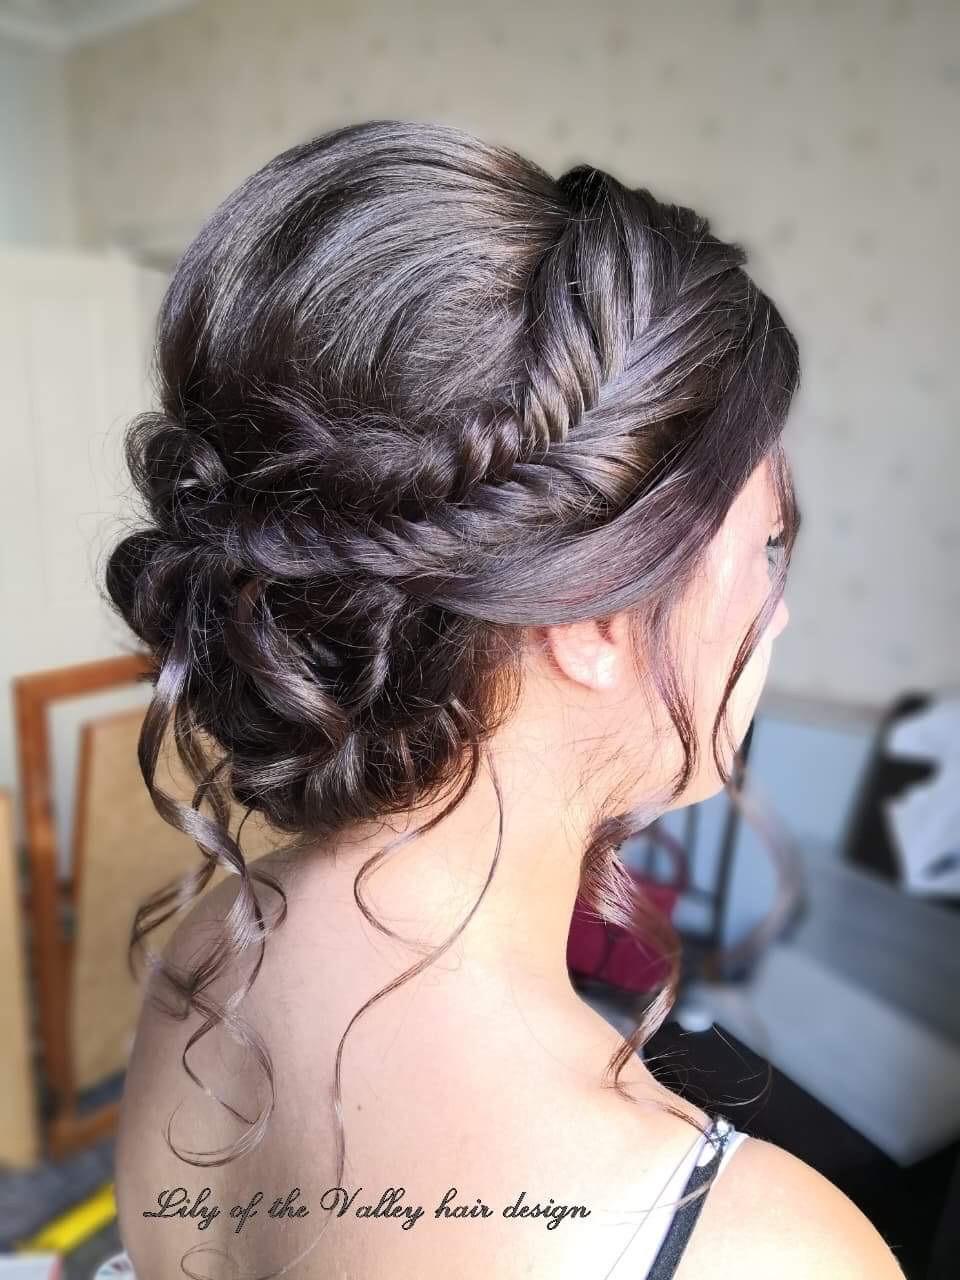 - Make Me Bridal Artist: Lily of the Valley hair design. #bohemian #bridalhair #brunette #romantichairup #braidedupdo #weddinghair #fishtailbraid #bridalhairstylist #plaits #beauty